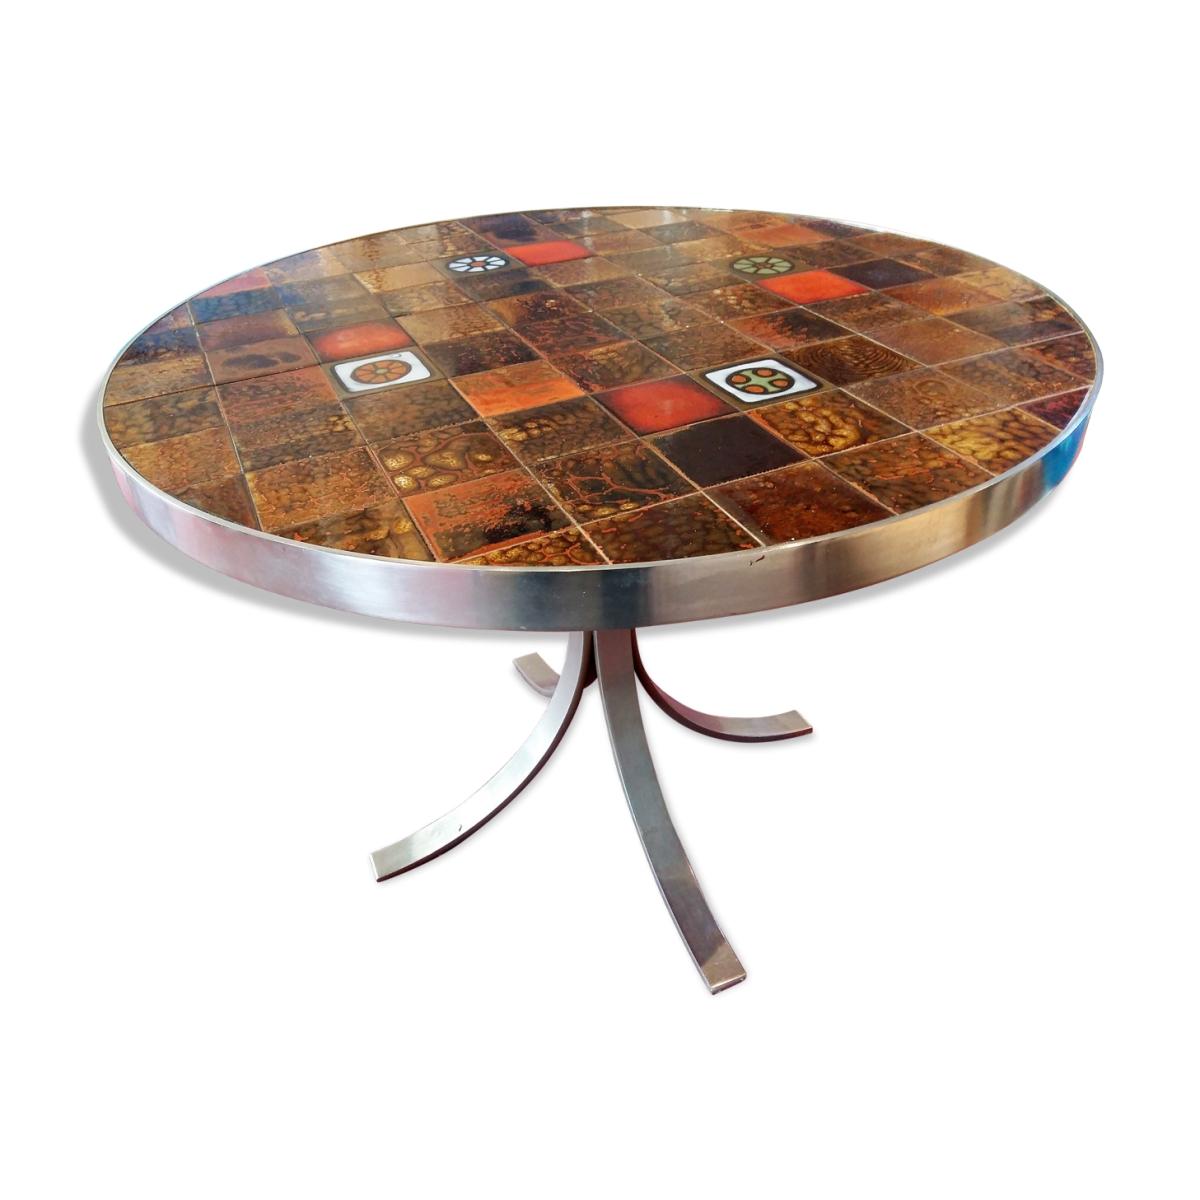 table ronde ann e 70 achats ventes expertises. Black Bedroom Furniture Sets. Home Design Ideas